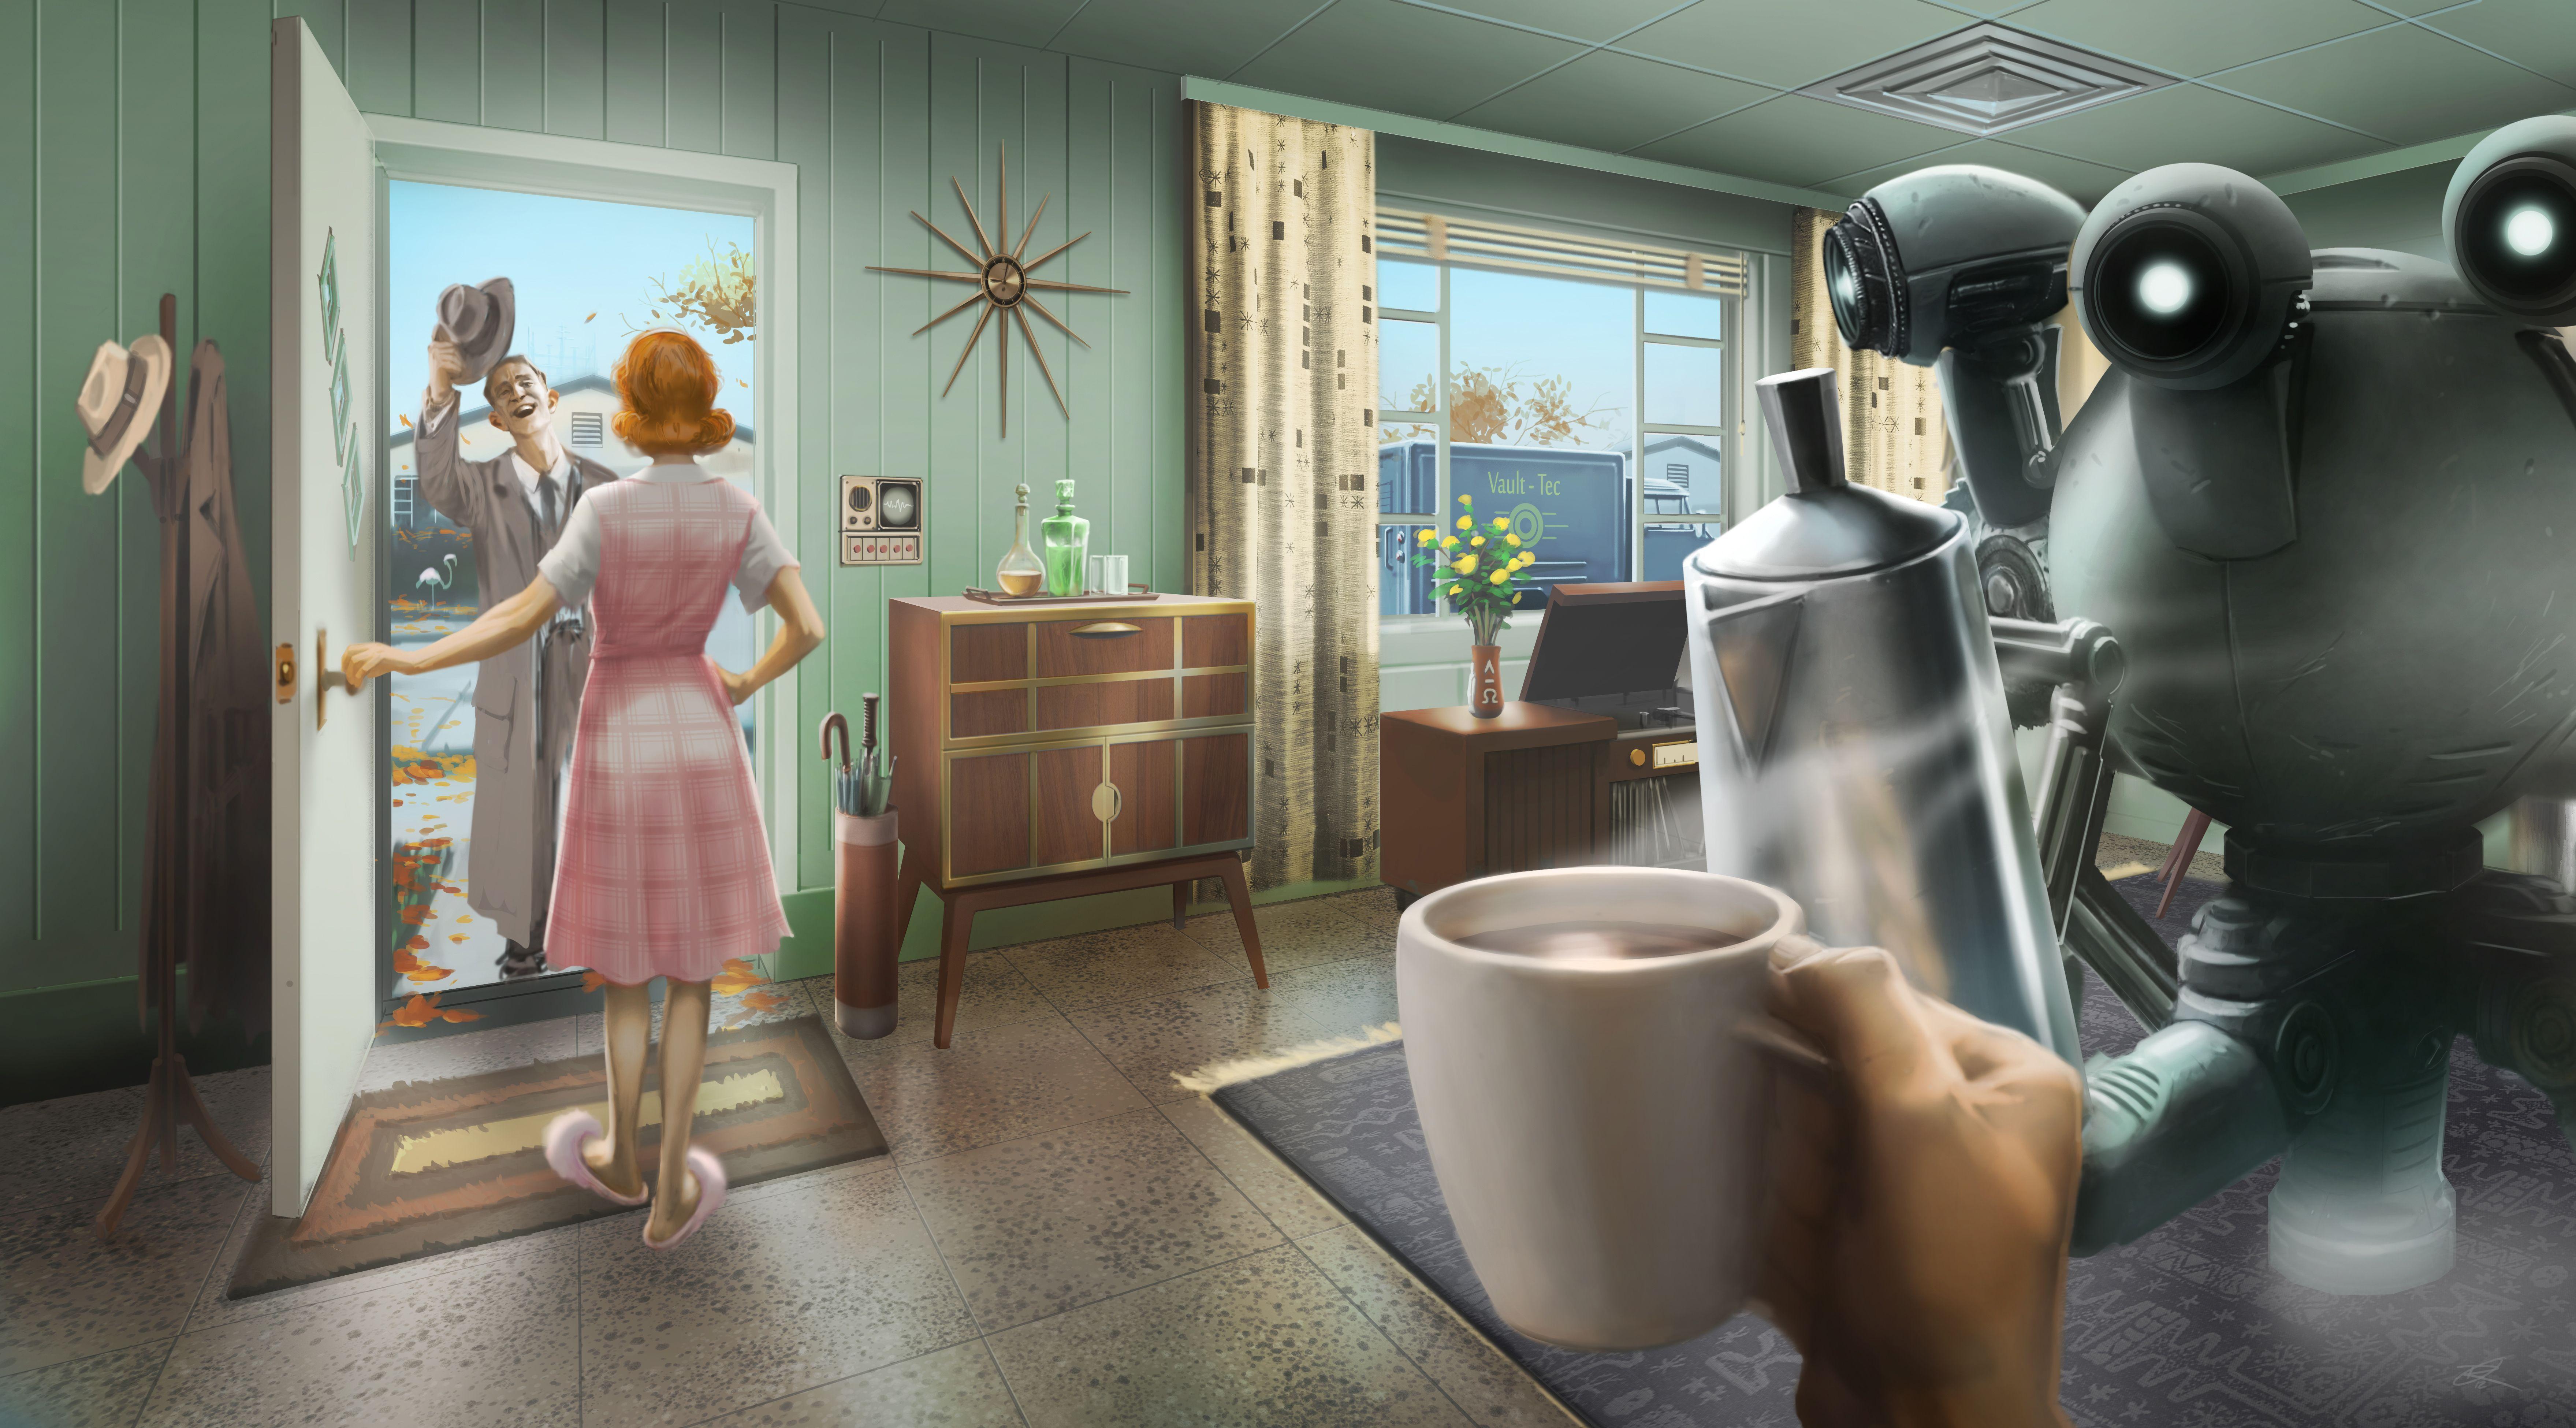 Fallout 4 Computer Wallpaper